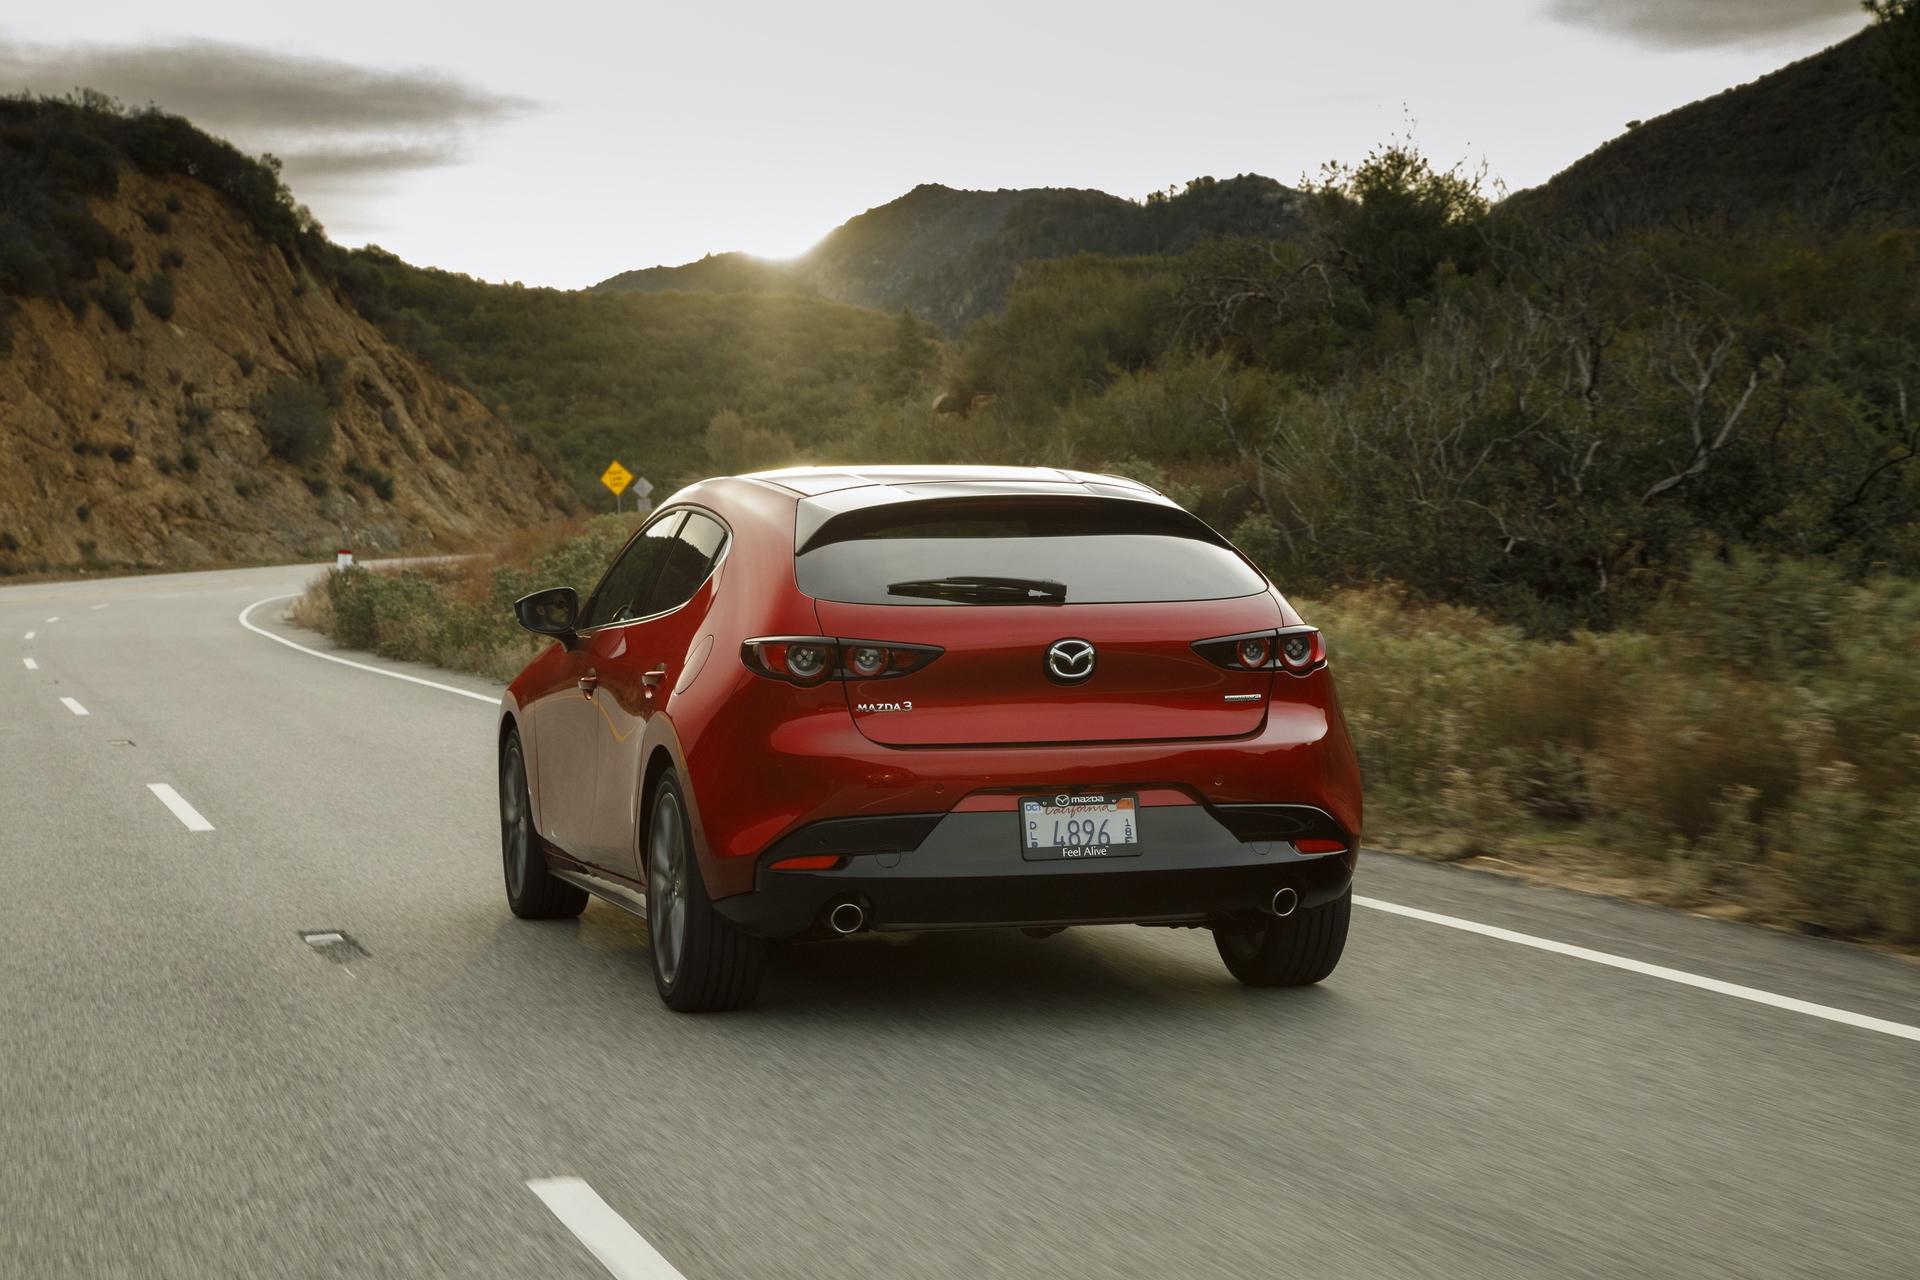 2019-Mazda3-Hatchback_12